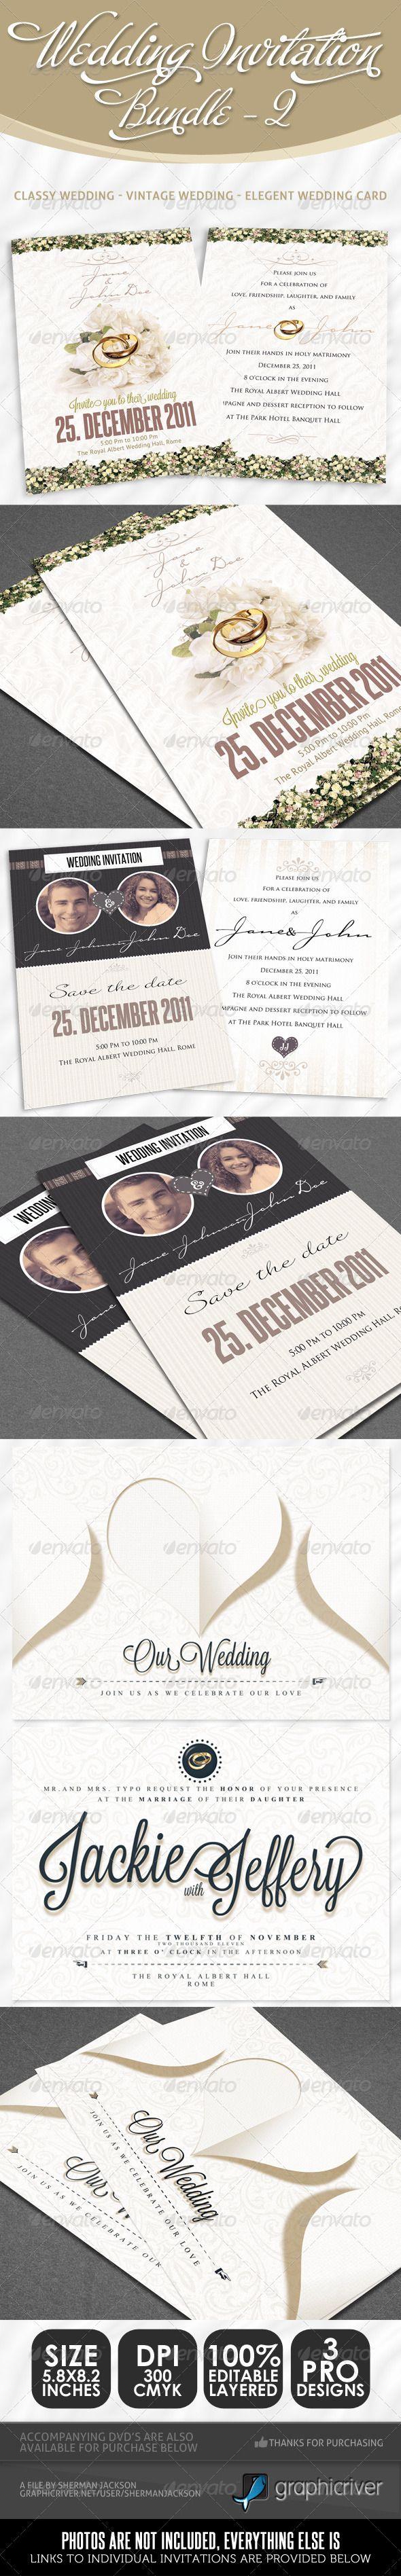 #Wedding Invitation Bundle - Pack 2 - Weddings #Cards & #Invites Download here: https://graphicriver.net/item/wedding-invitation-bundle-pack-2/2653594?ref=alena994